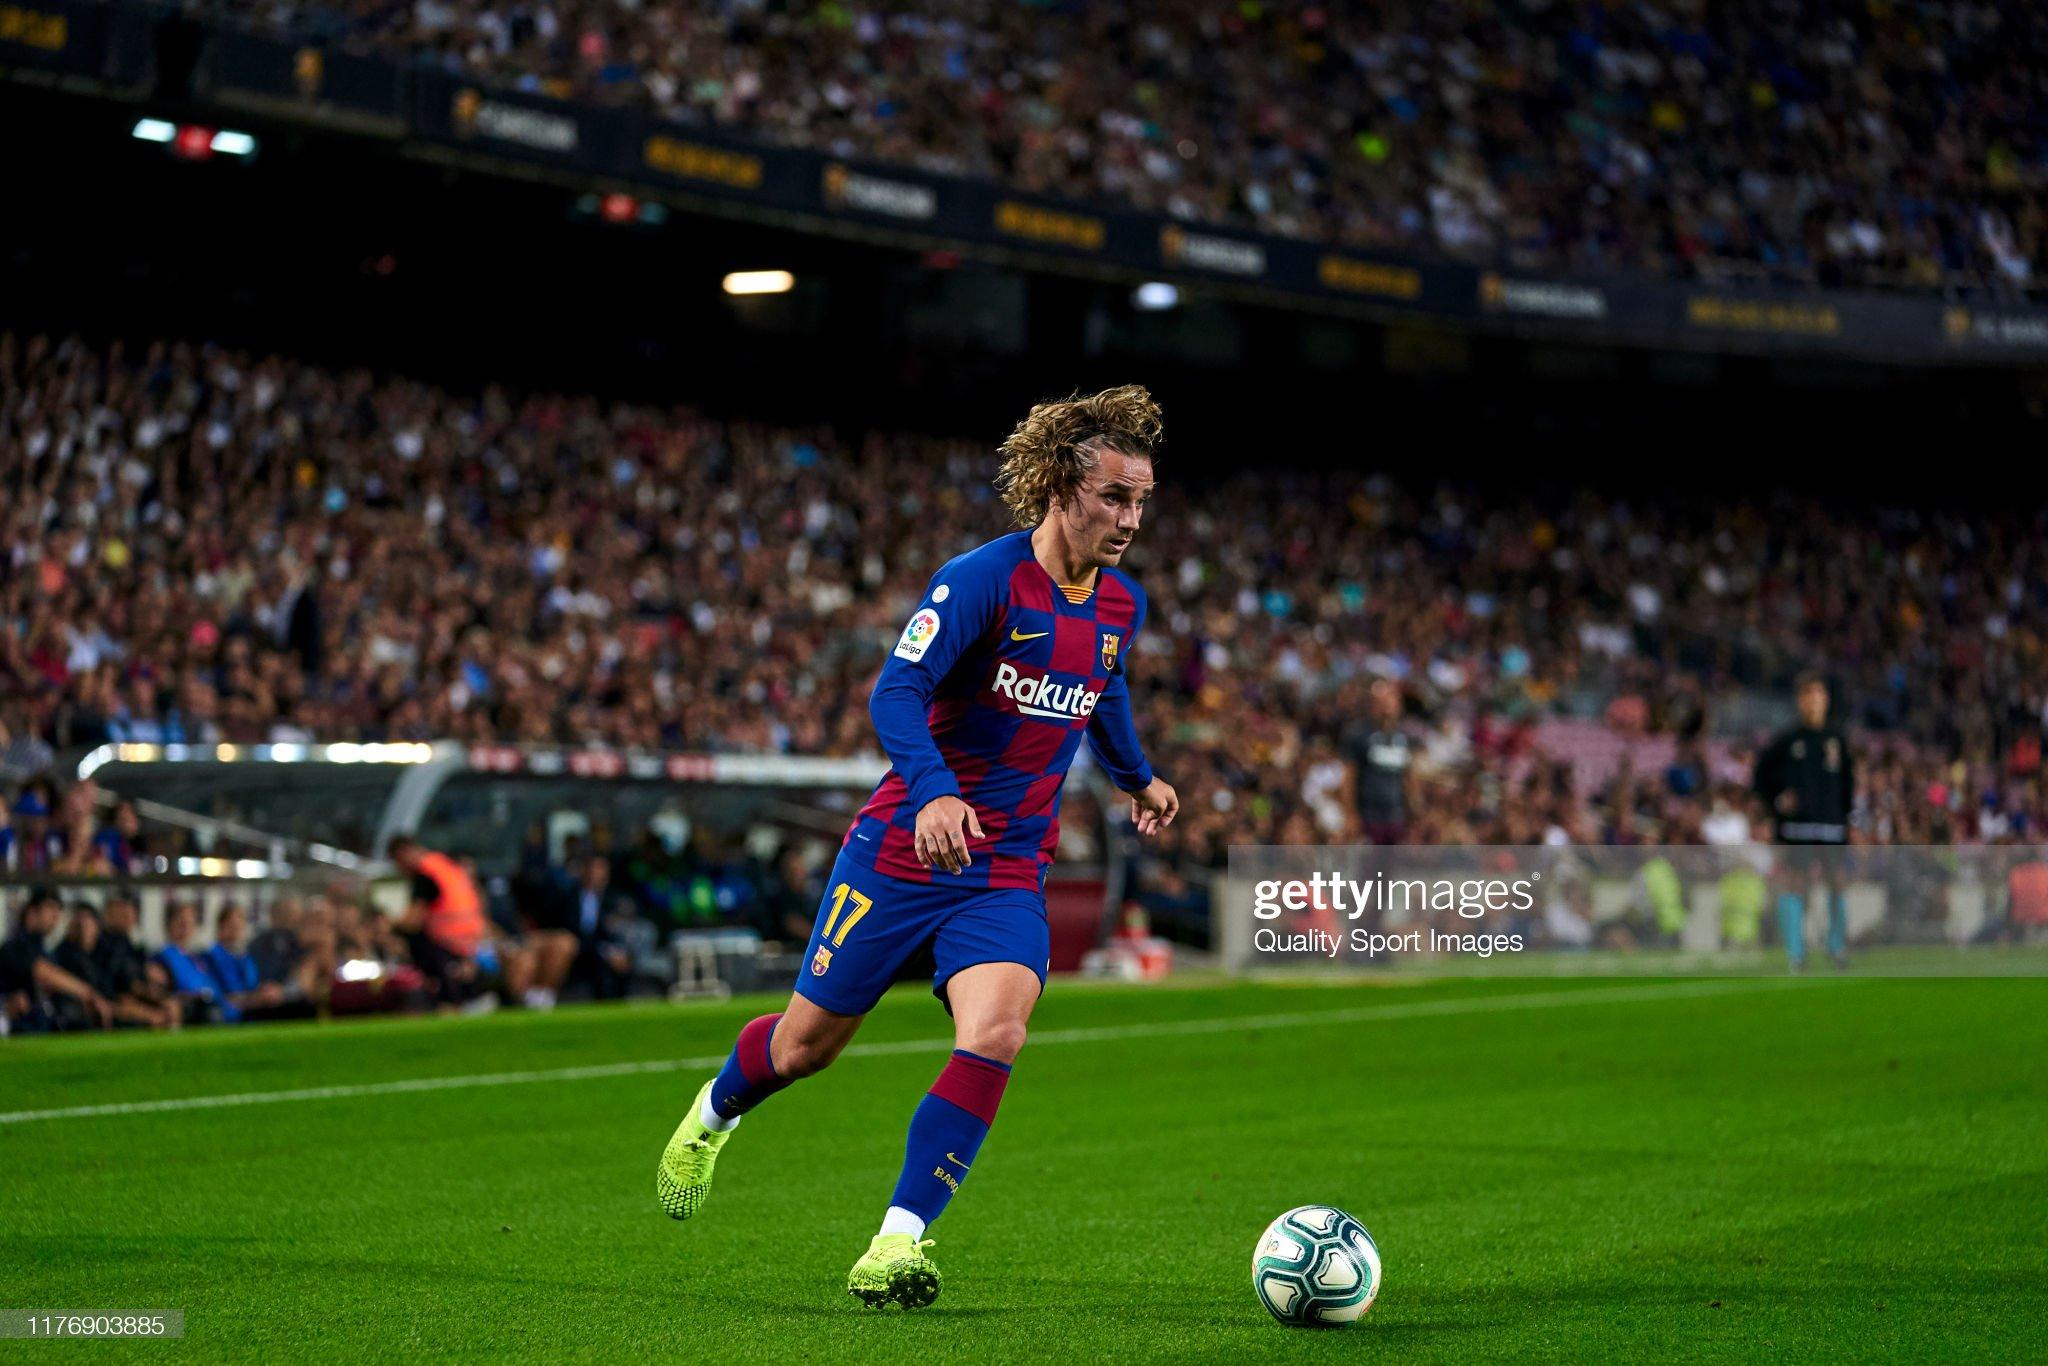 صور مباراة : برشلونة - فياريال 2-1 ( 24-09-2019 )  Antoine-griezmann-of-fc-barcelona-with-the-ball-during-the-liga-match-picture-id1176903885?s=2048x2048